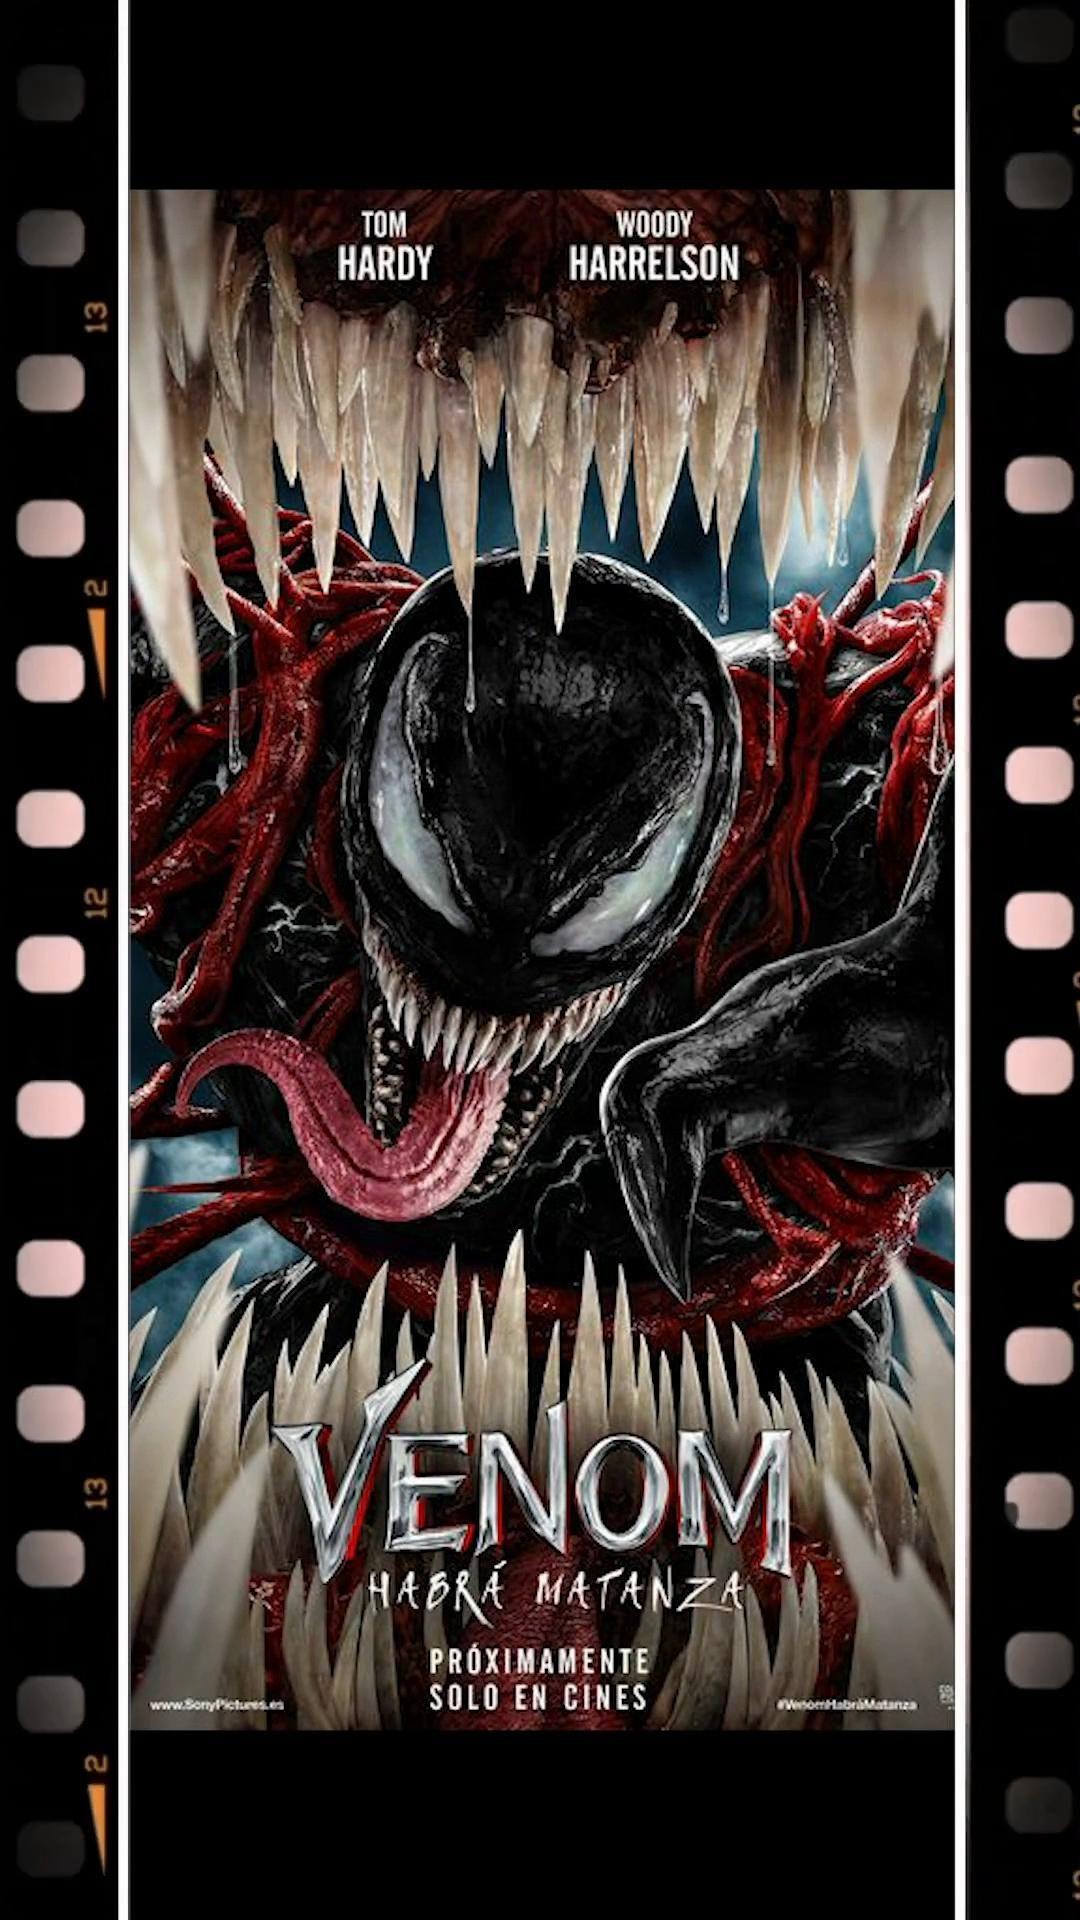 Venom 2 / Carnage